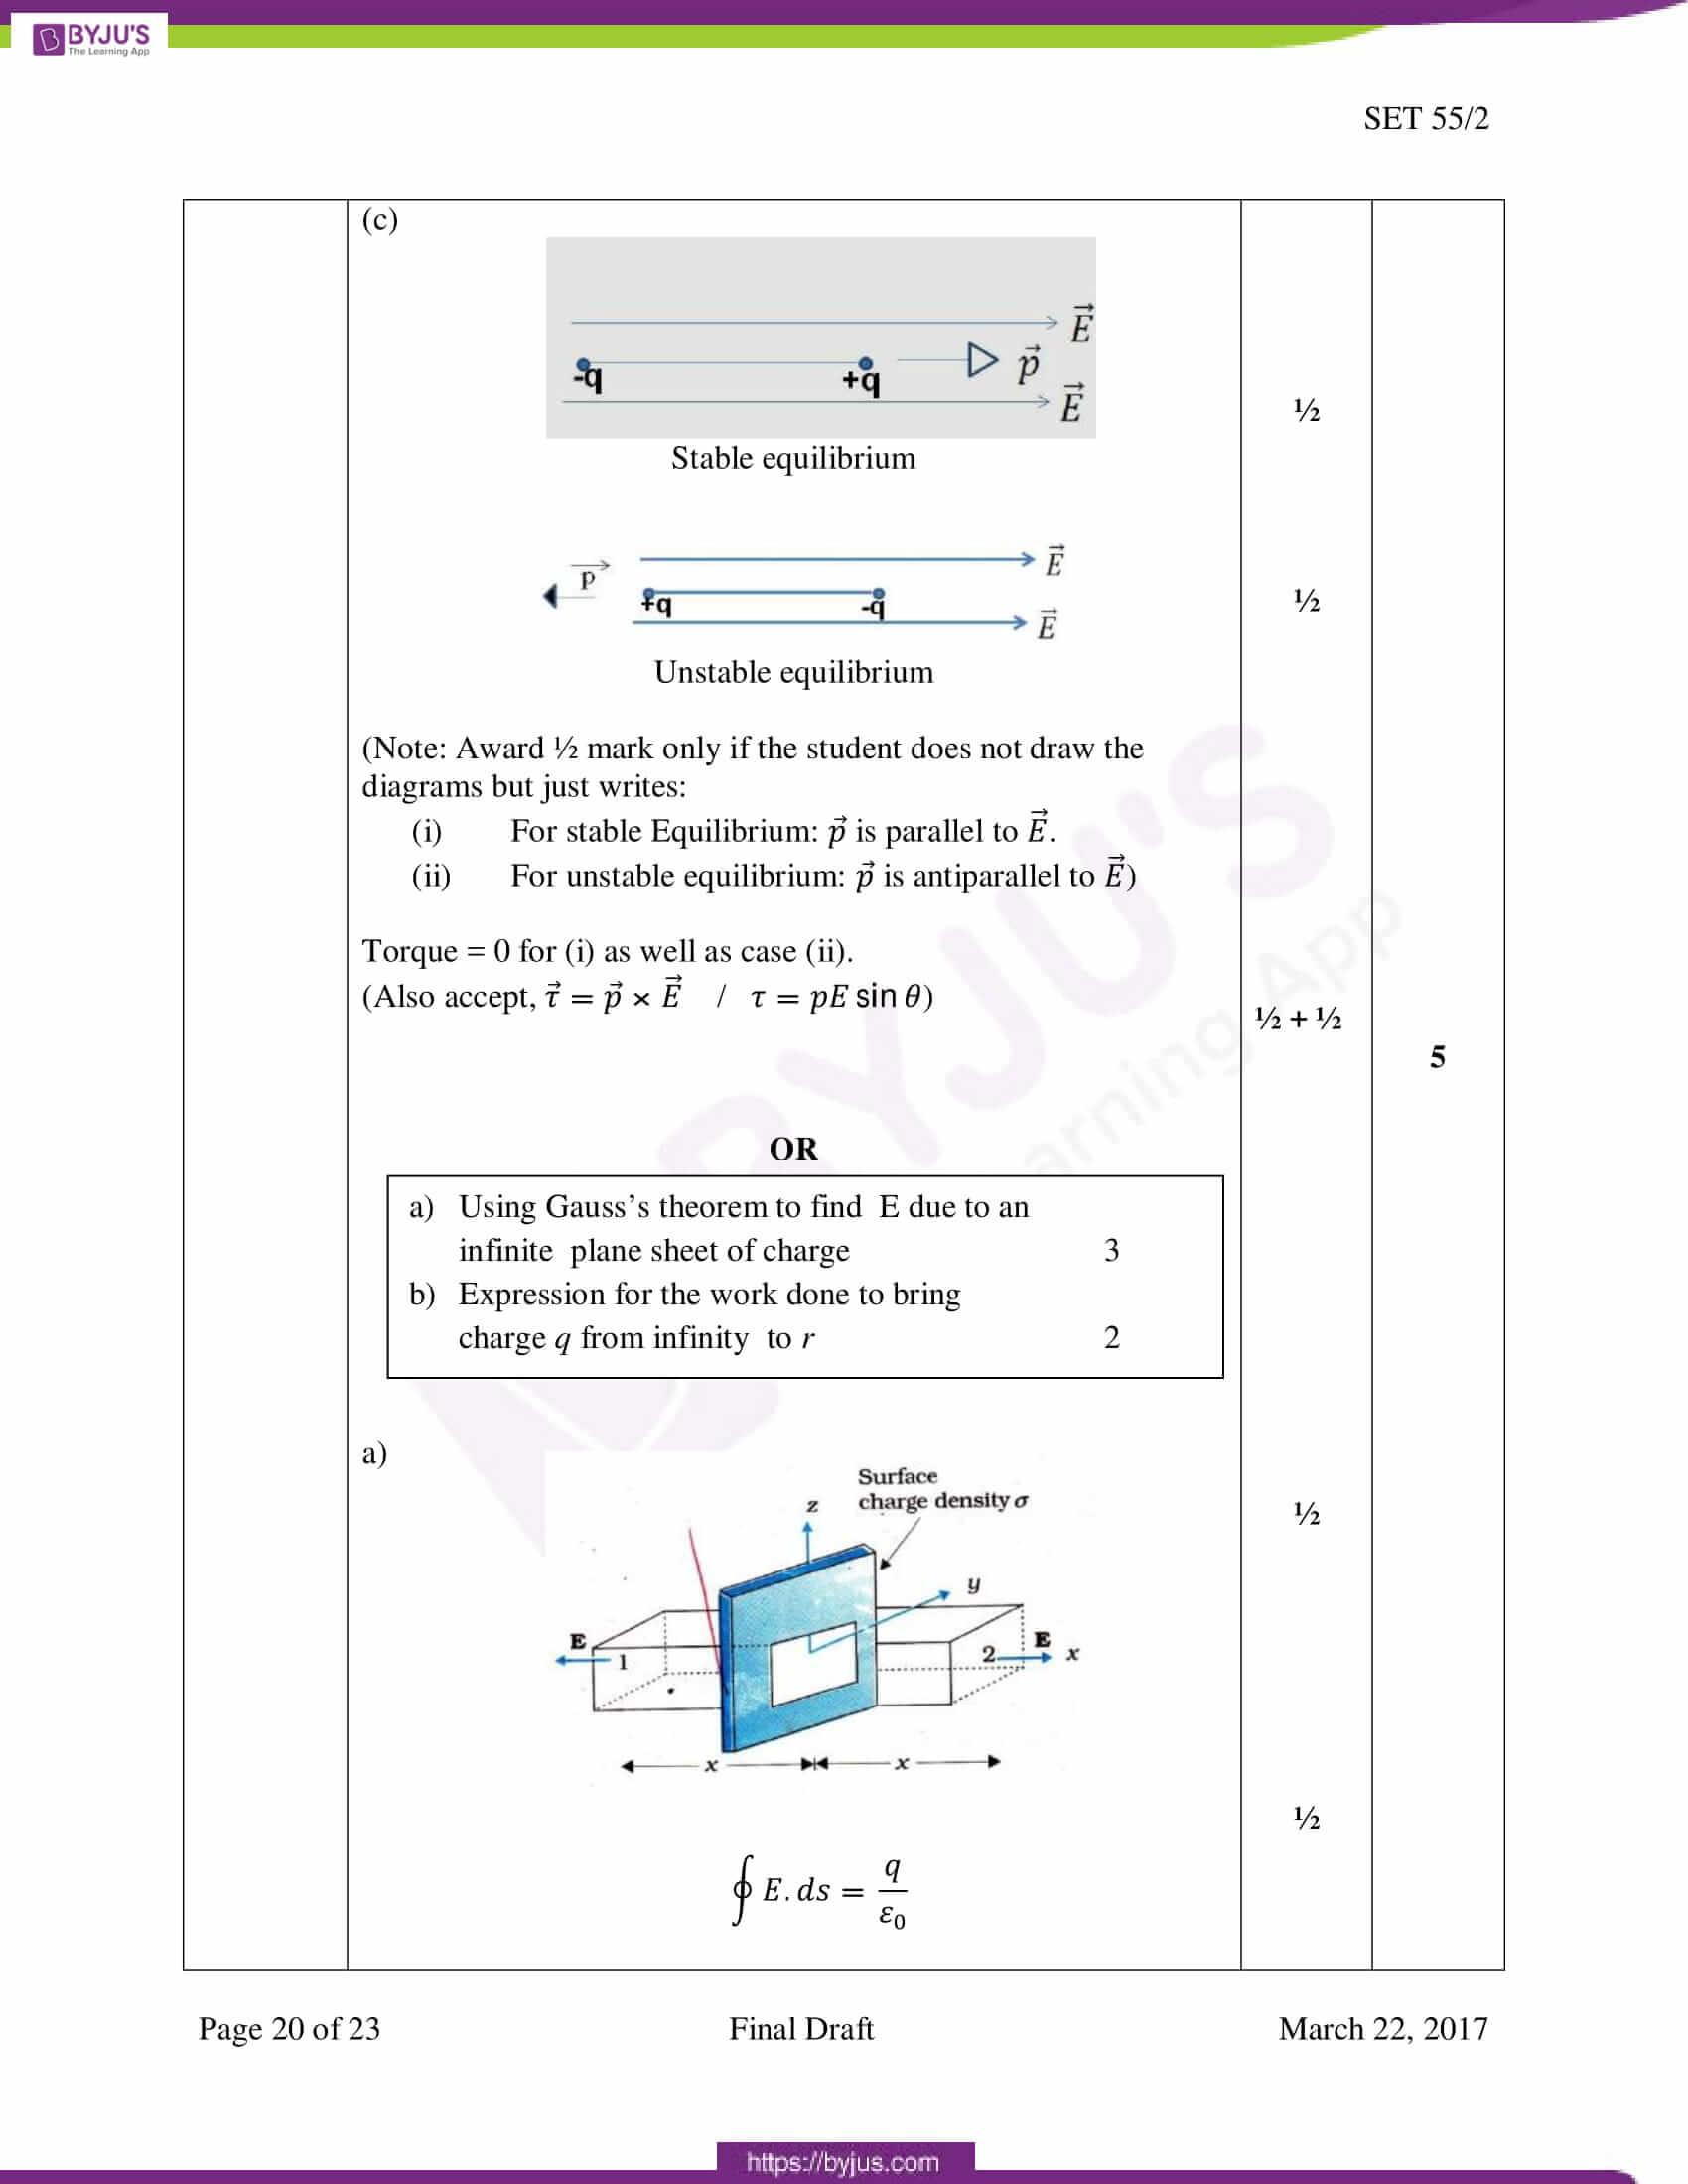 cbse class 12 phy 2017 solution set 1